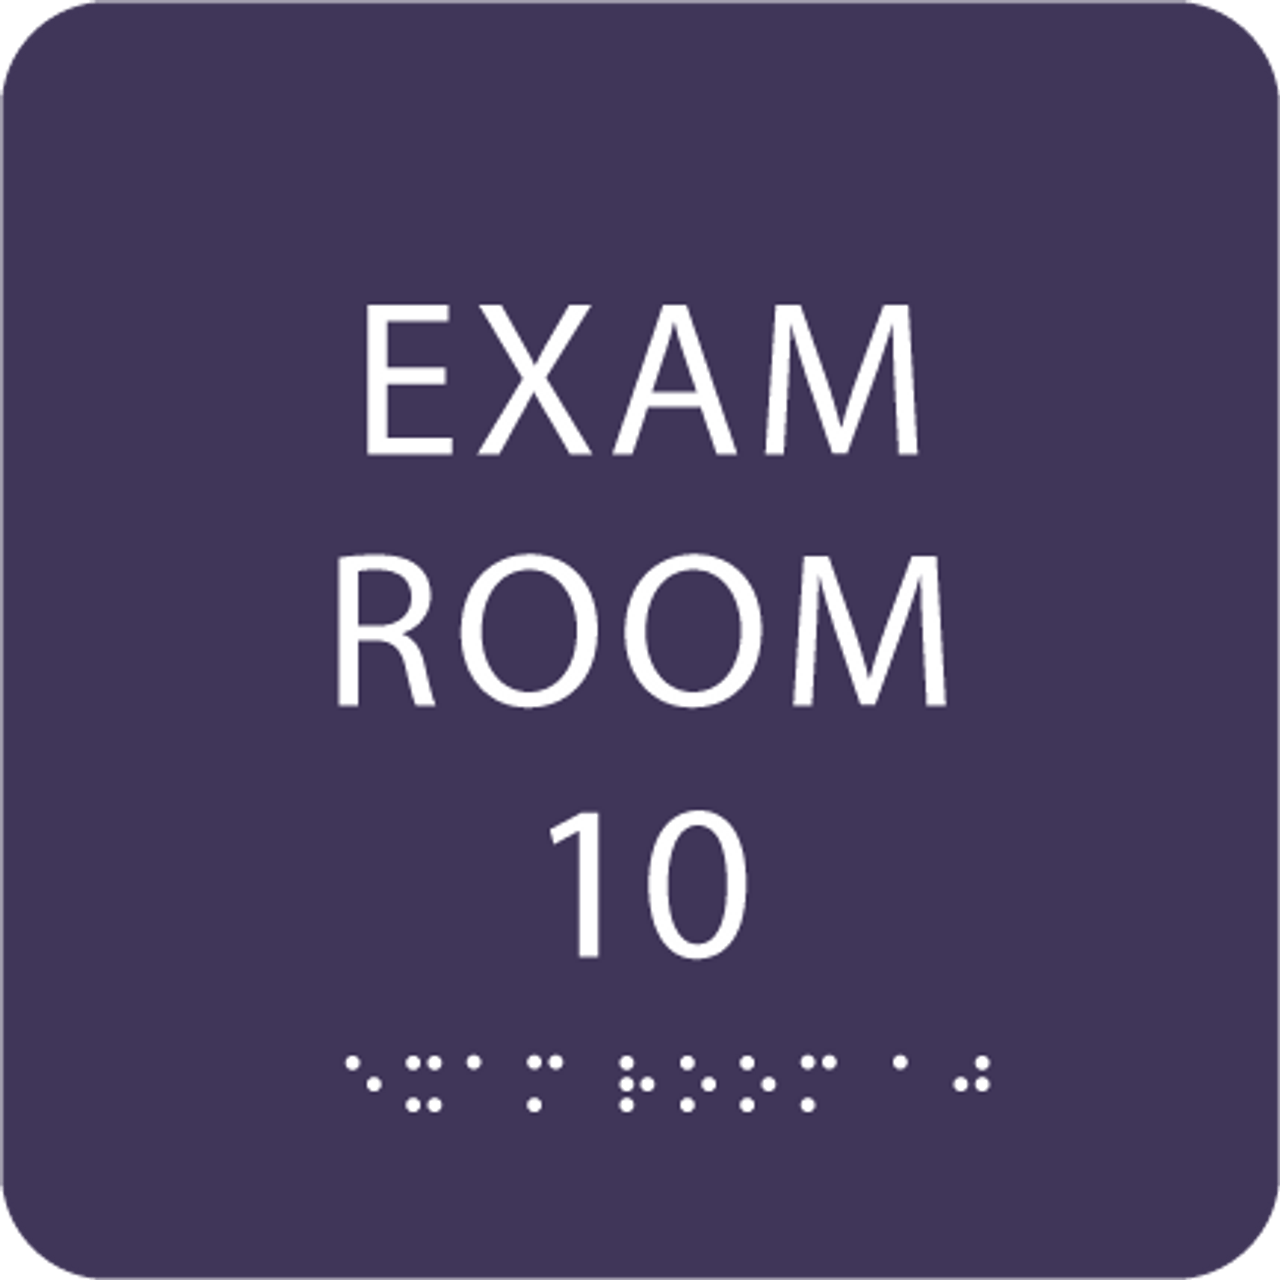 Purple Exam Room 10 Sign w/ ADA Braille